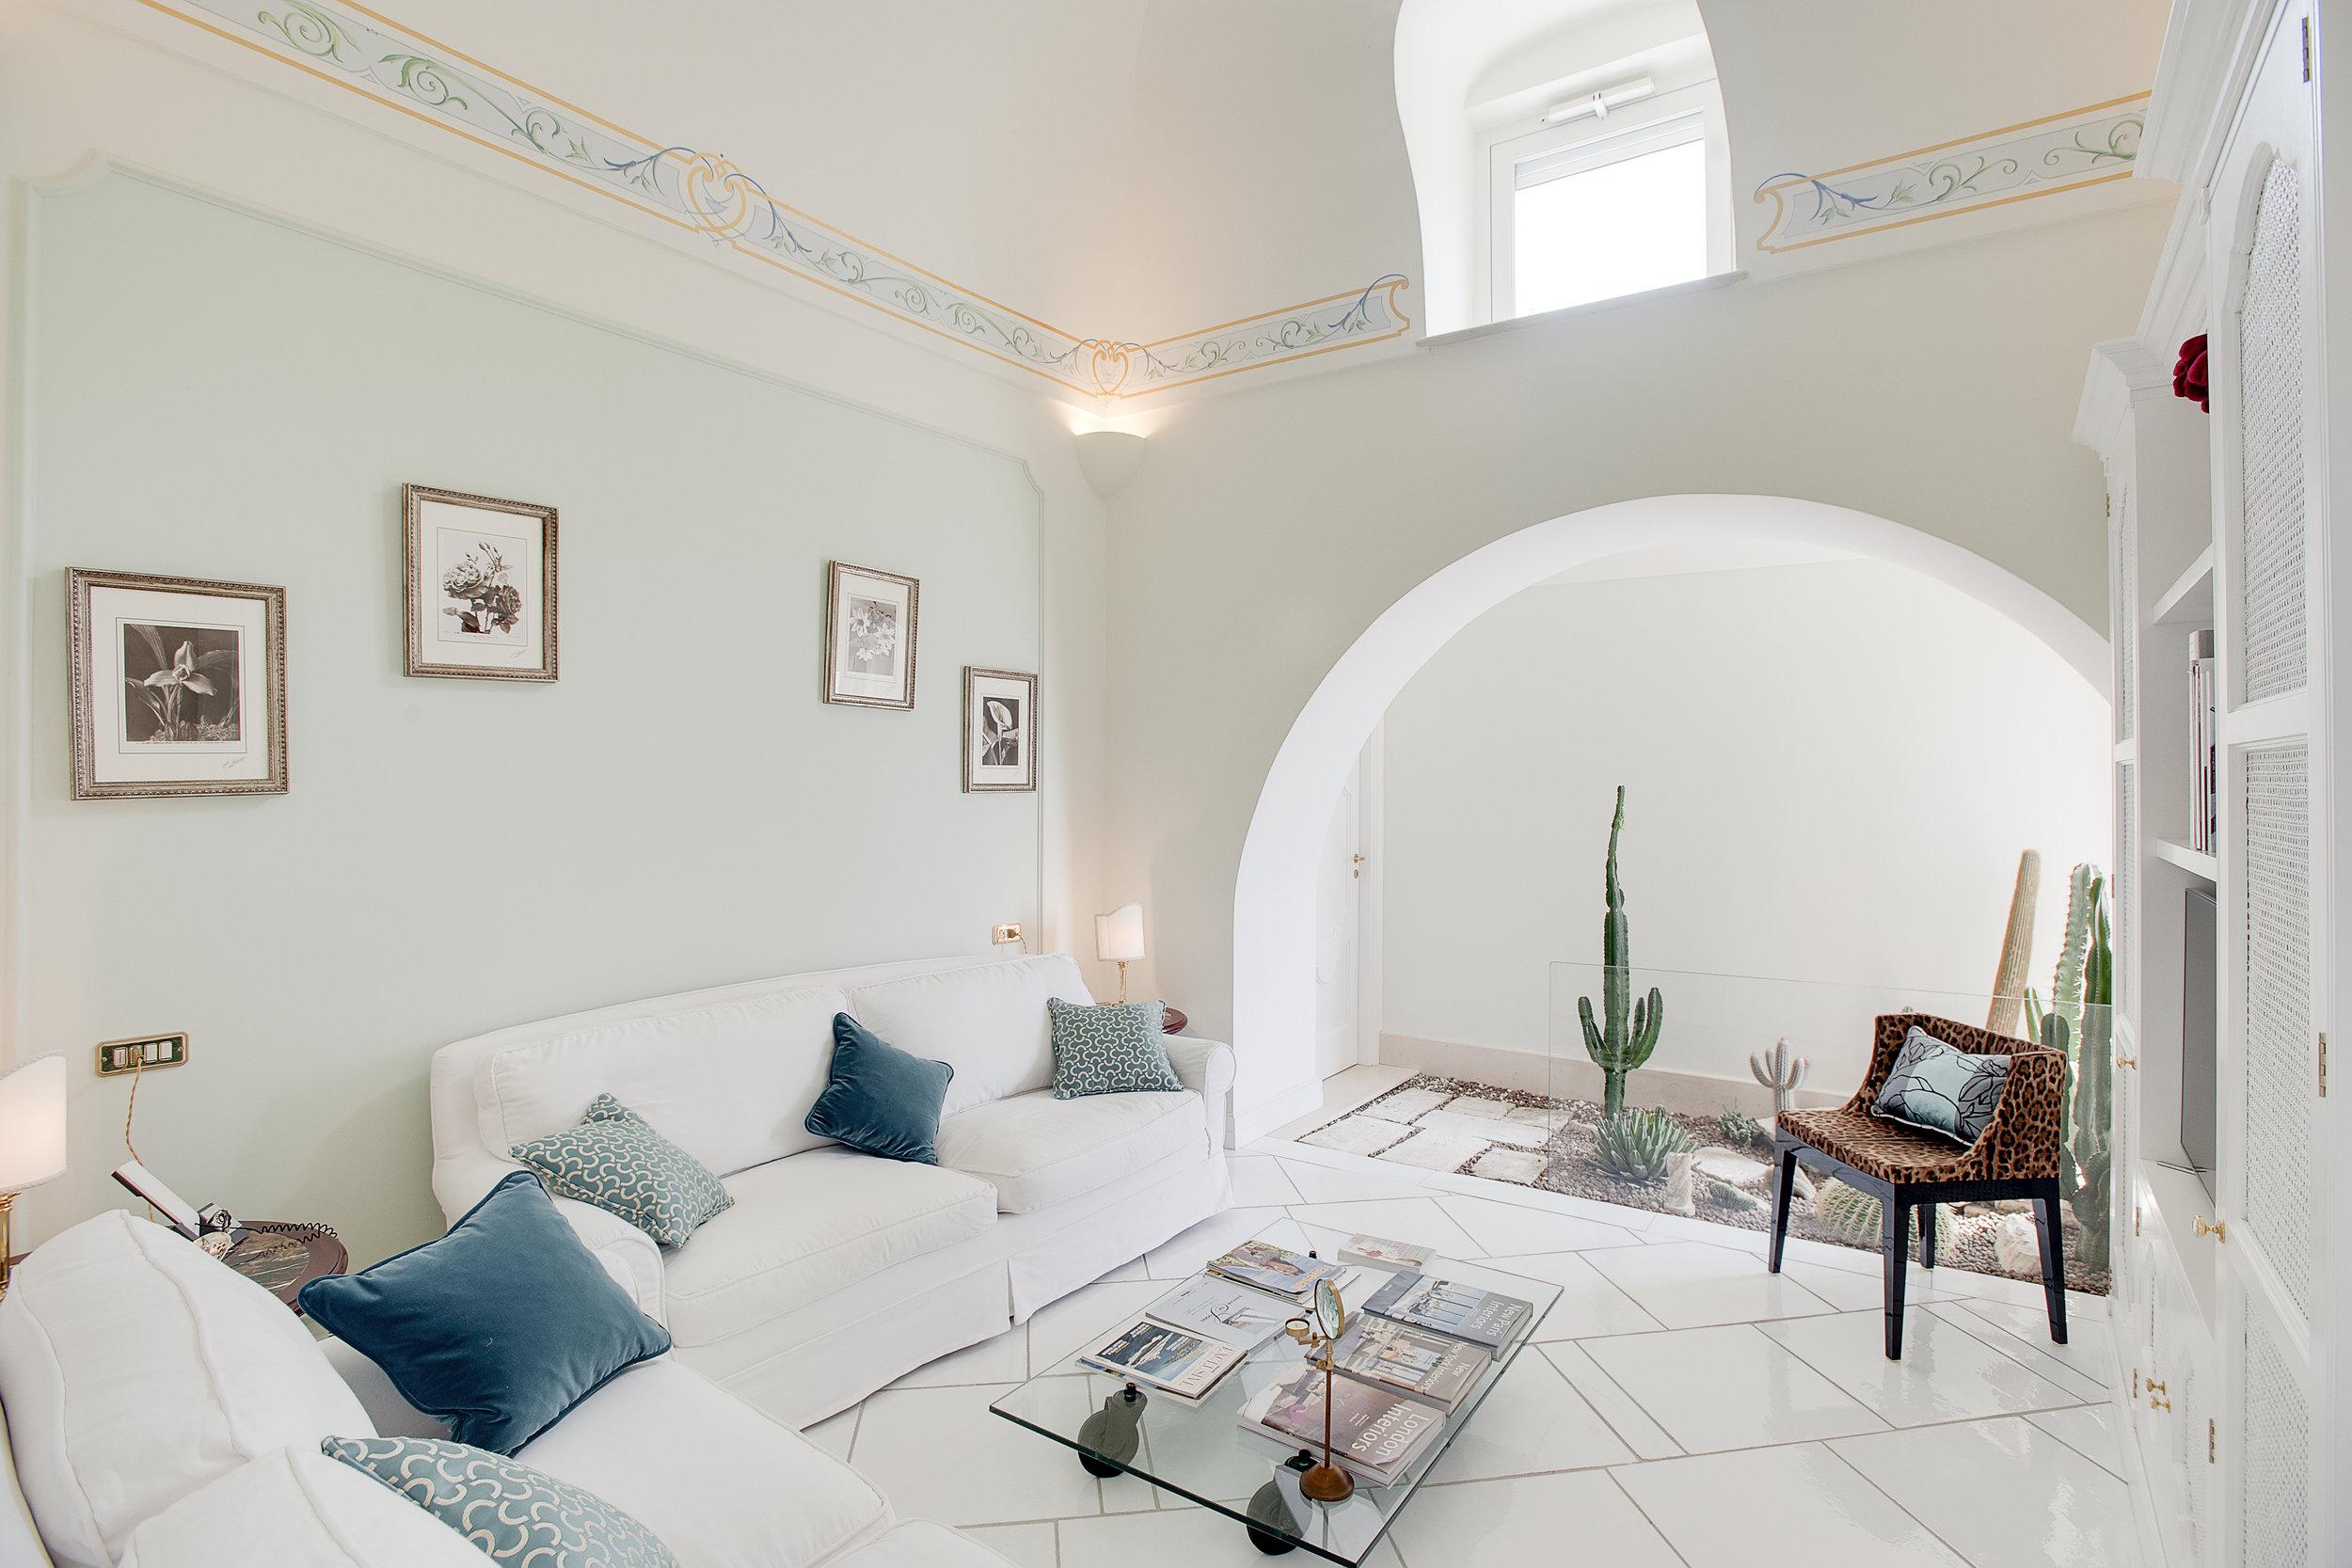 Living room of Villa Baia https://www.villaslink.com/blog/2017/3/18/walking-down-to-the-sea